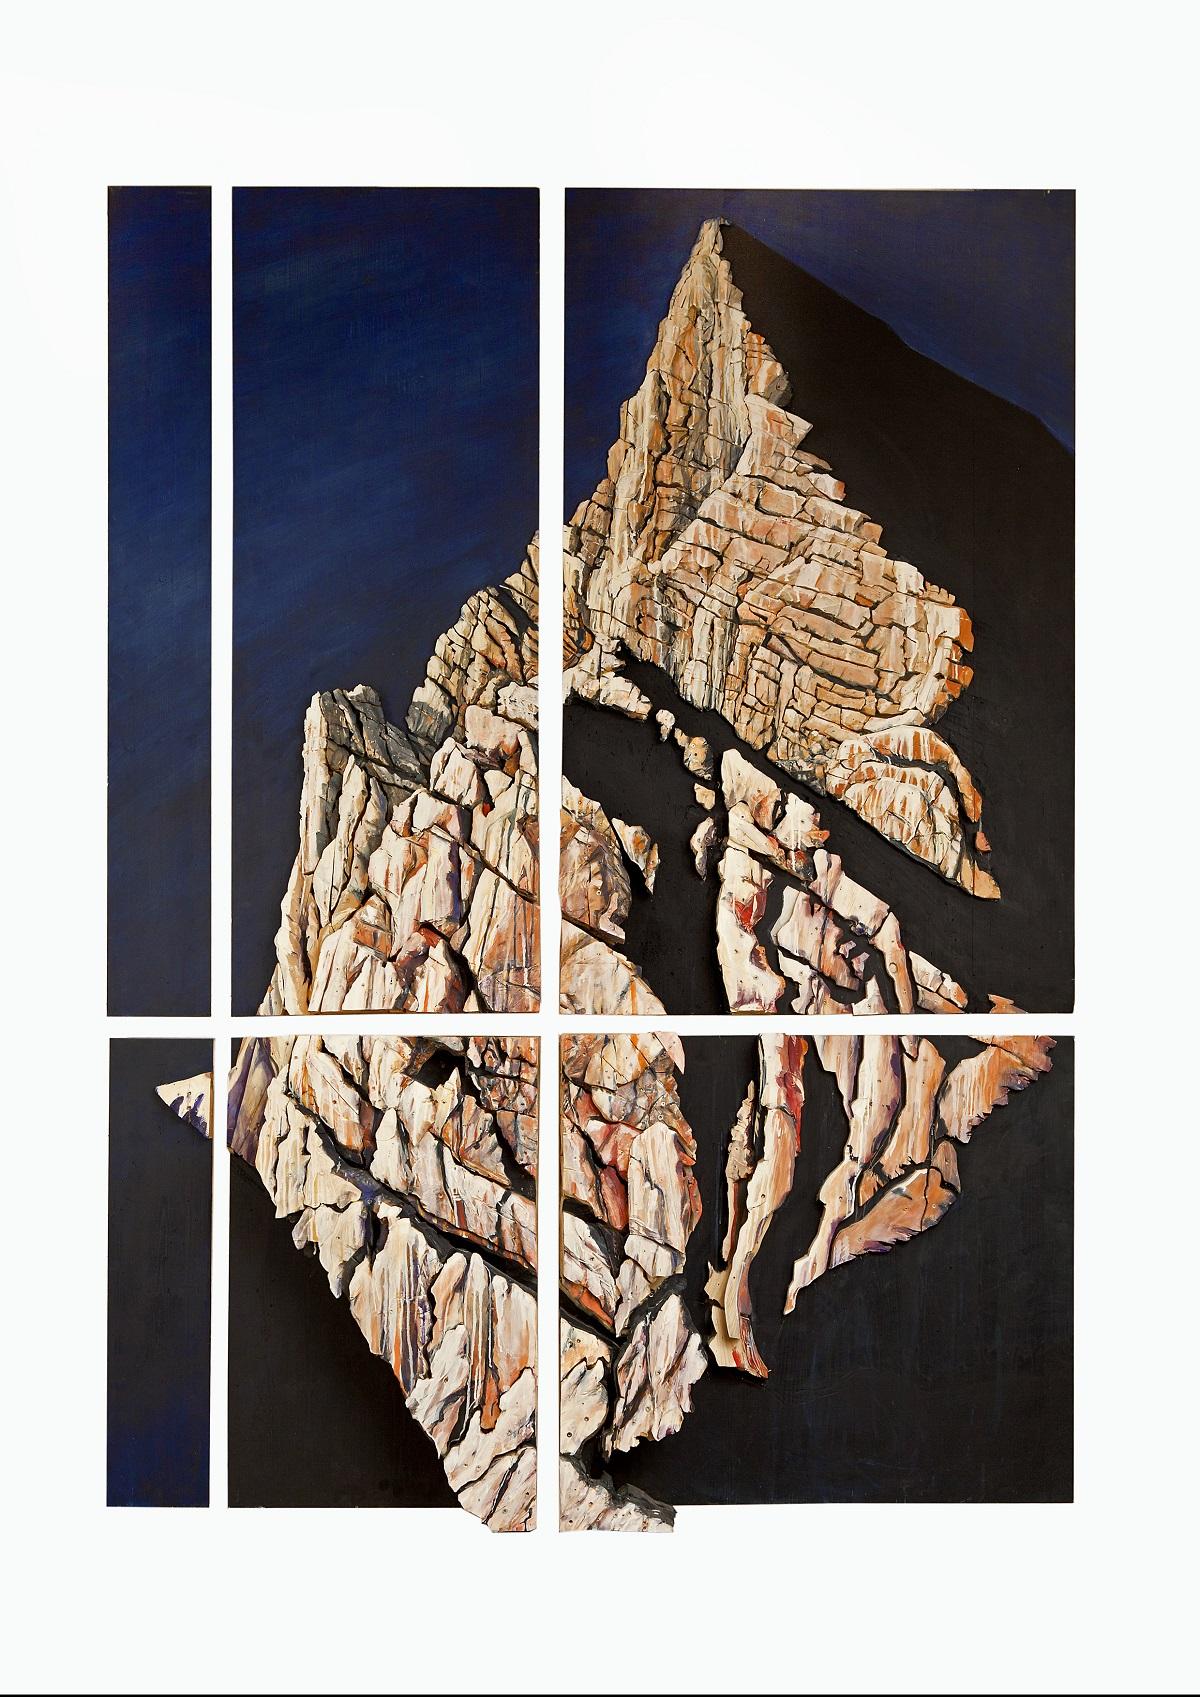 "#154 Lois Wagner (1959) ""Planspitze"" Image"